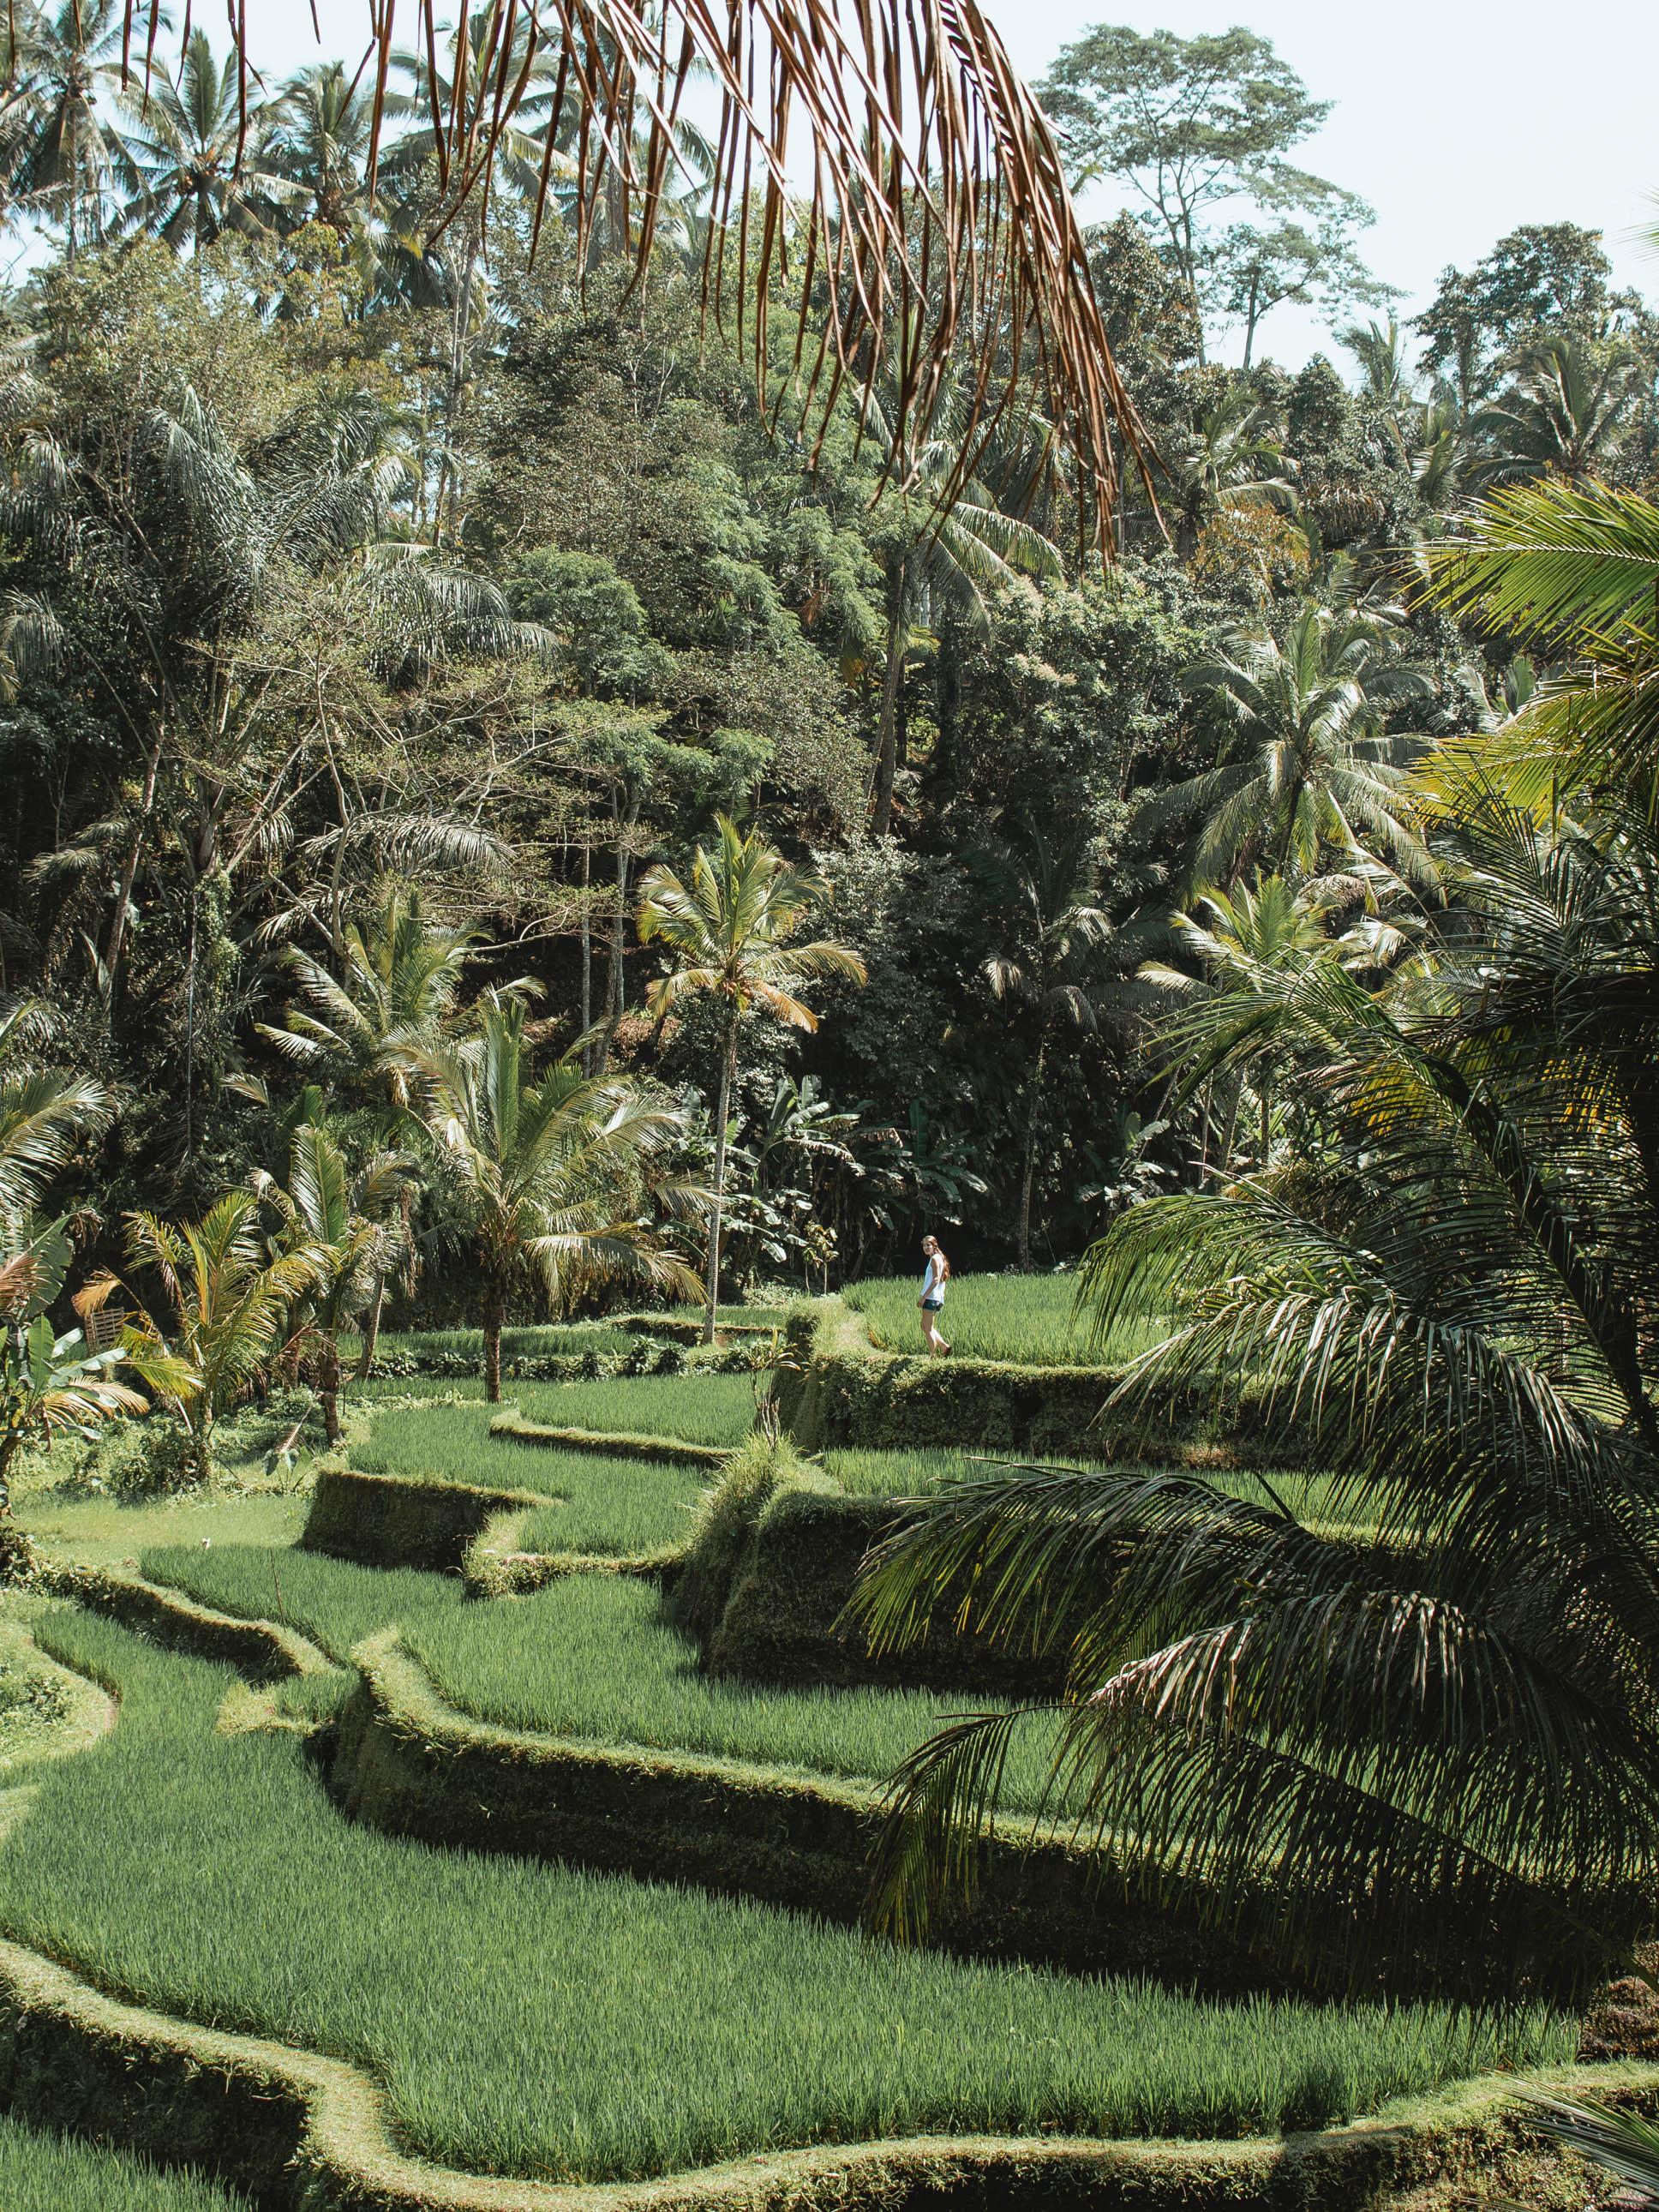 Tegalalang Rice Terraces in Ubud, Bali